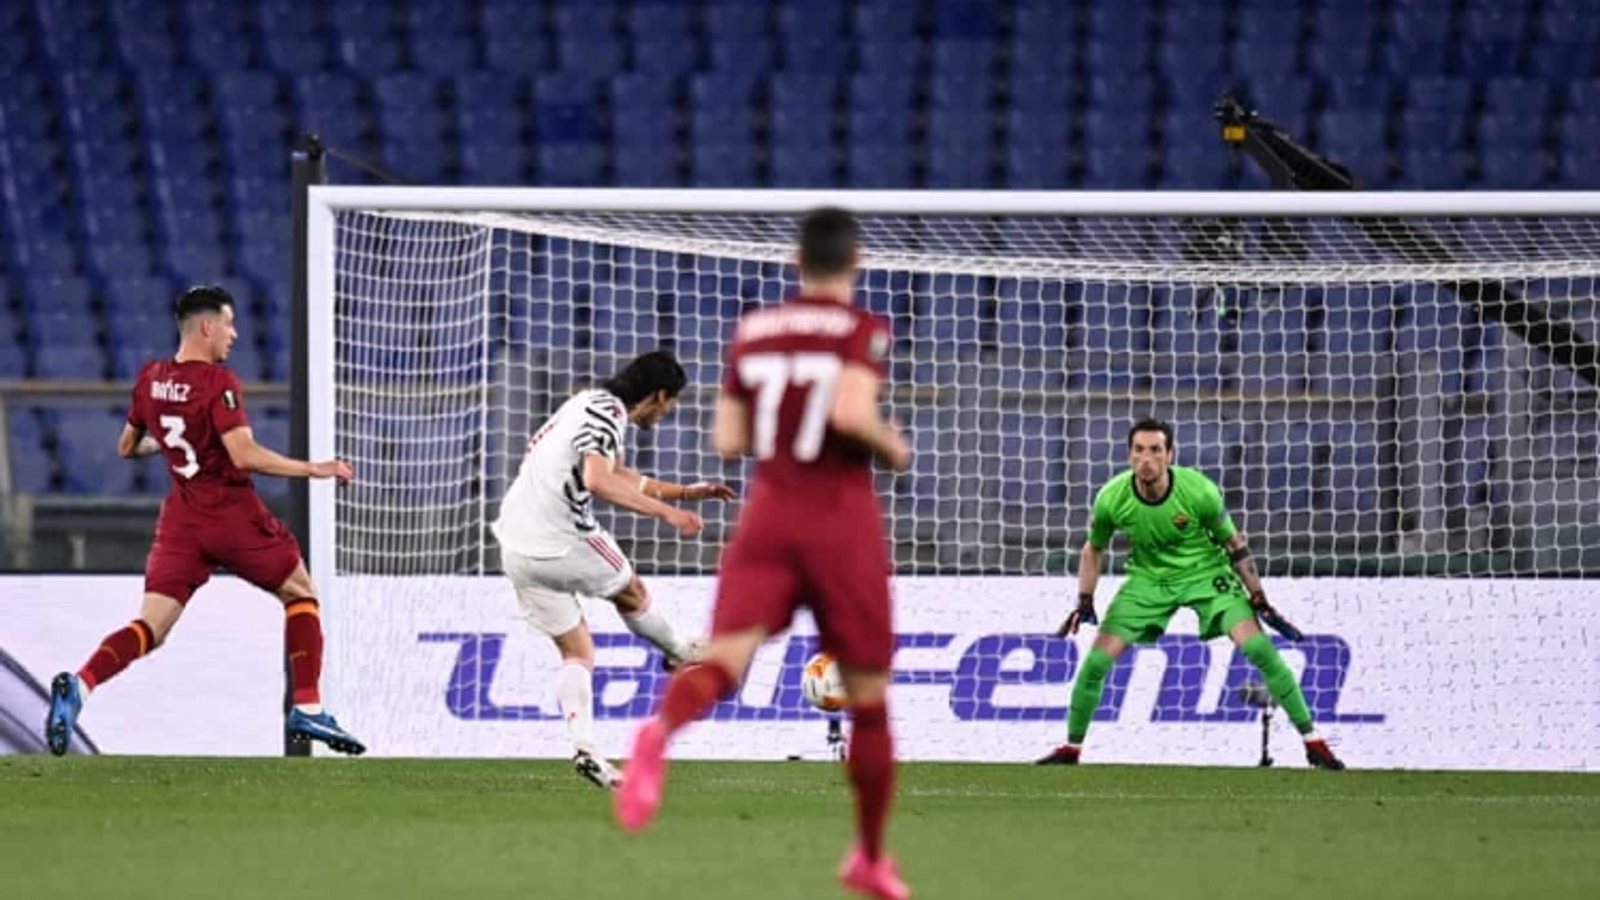 TRỰC TIẾP AS Roma 0-1 MU: Edinson Cavani ghi bàn đẳng cấp